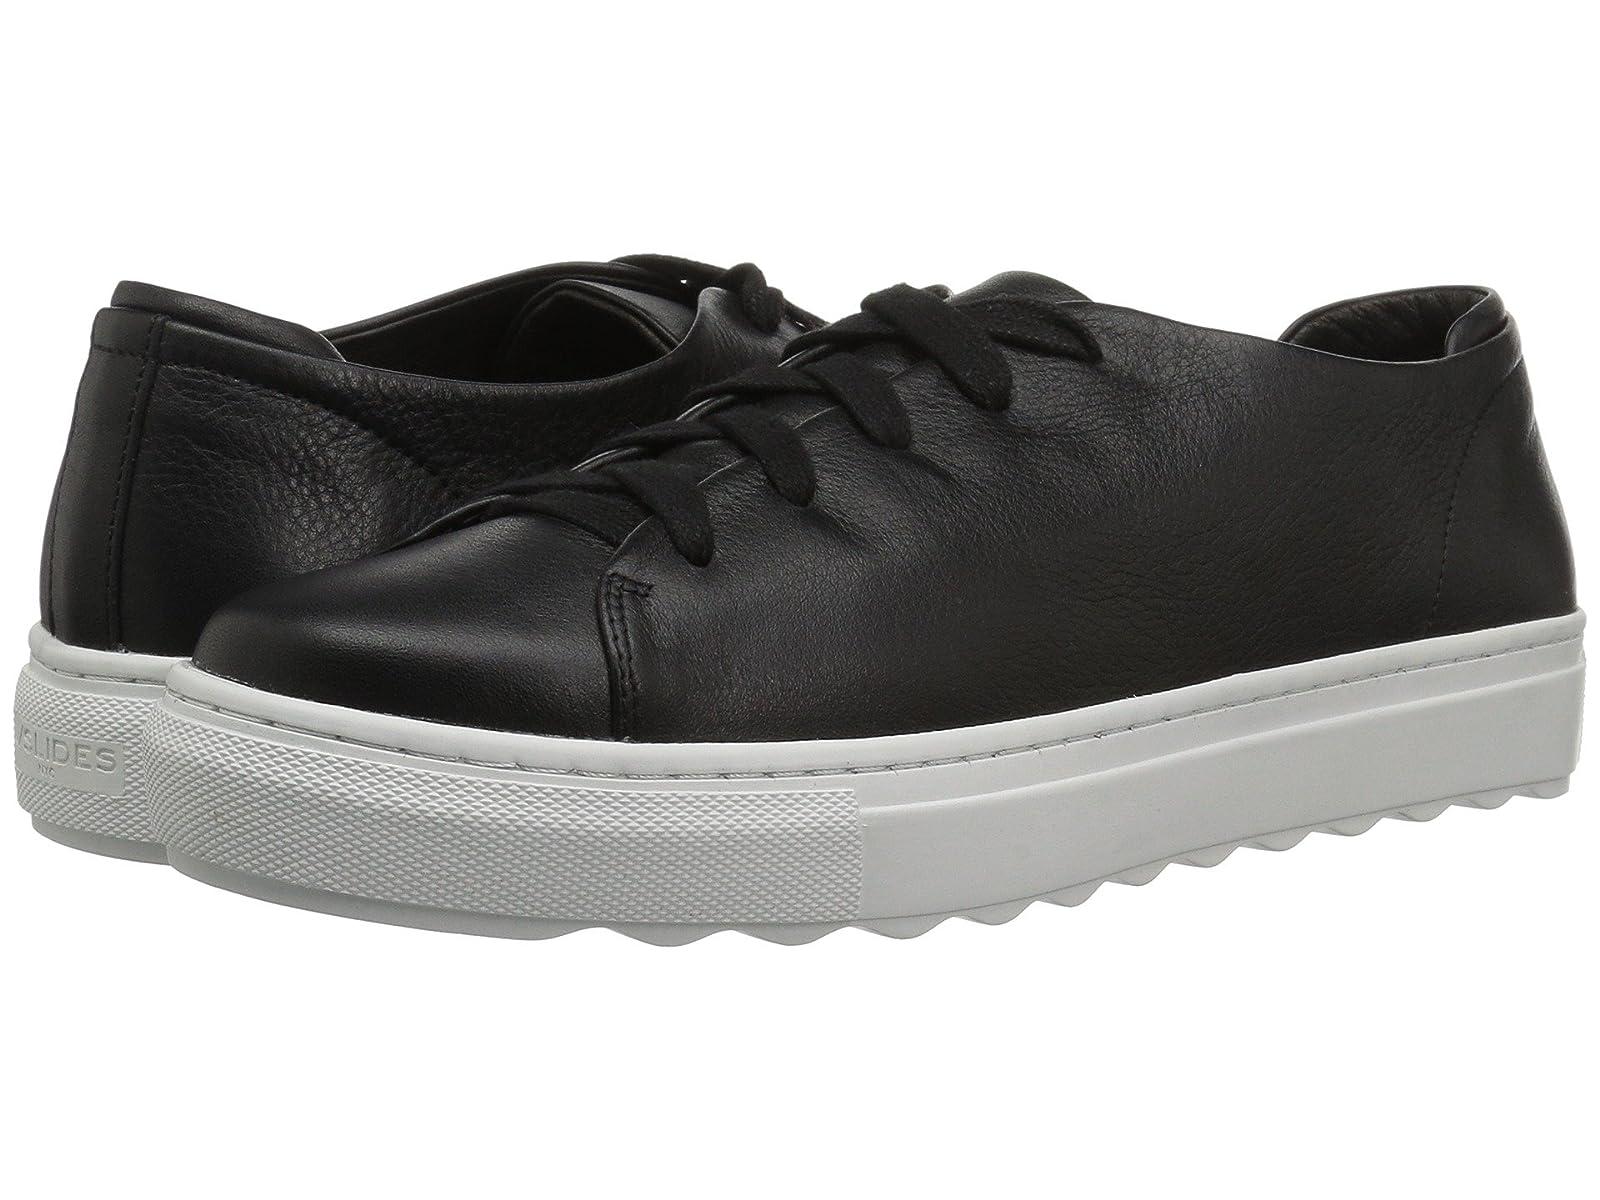 J/Slides PollieCheap and distinctive eye-catching shoes